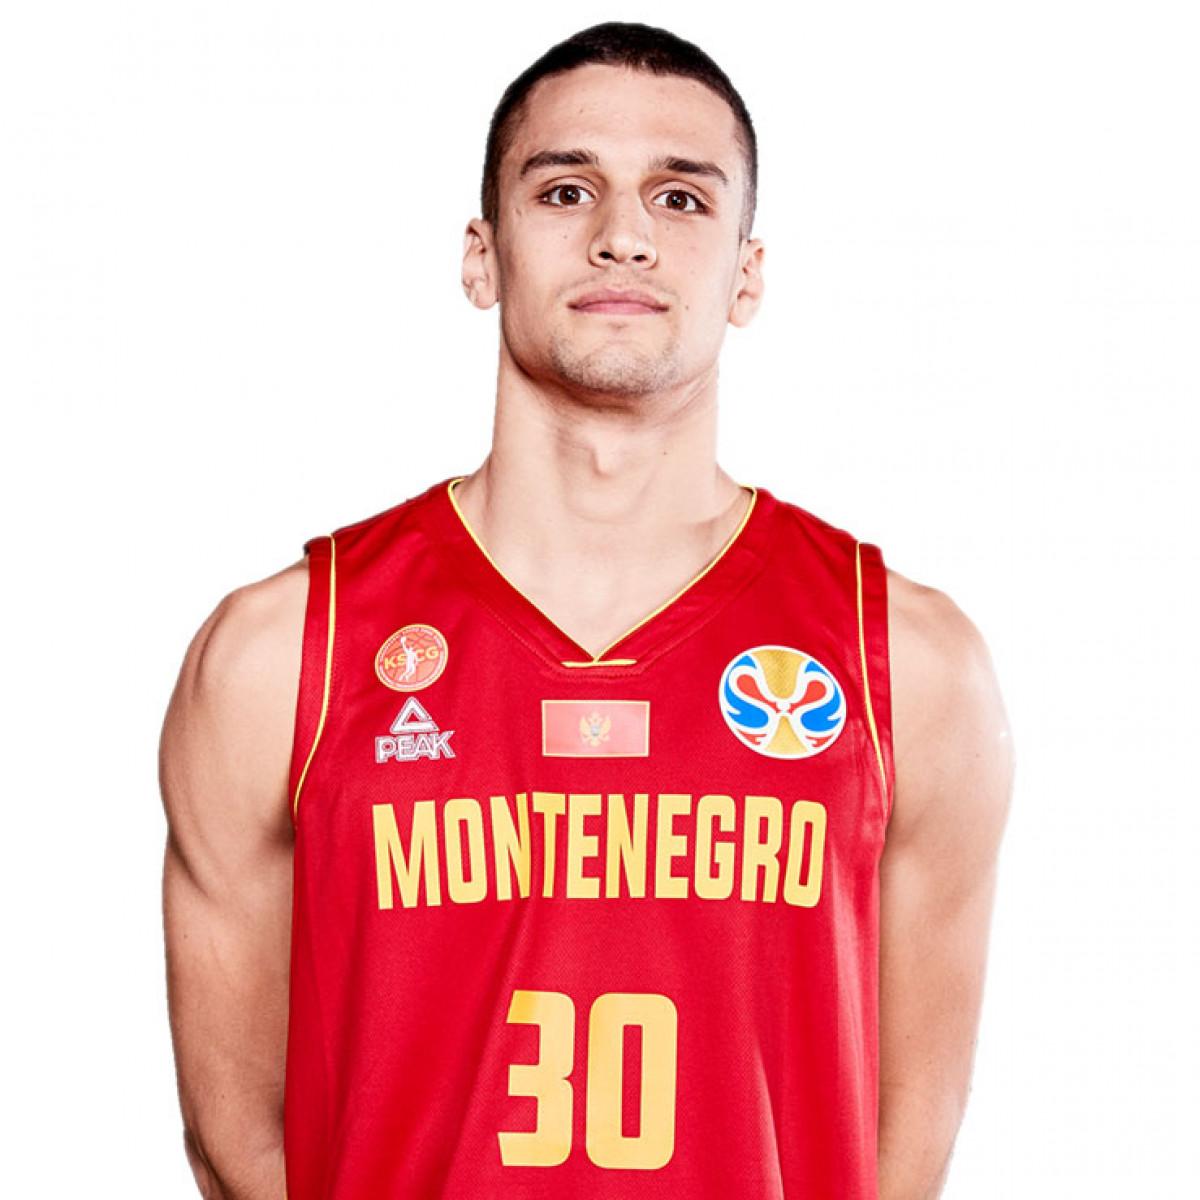 Photo of Petar Popovic, 2019-2020 season